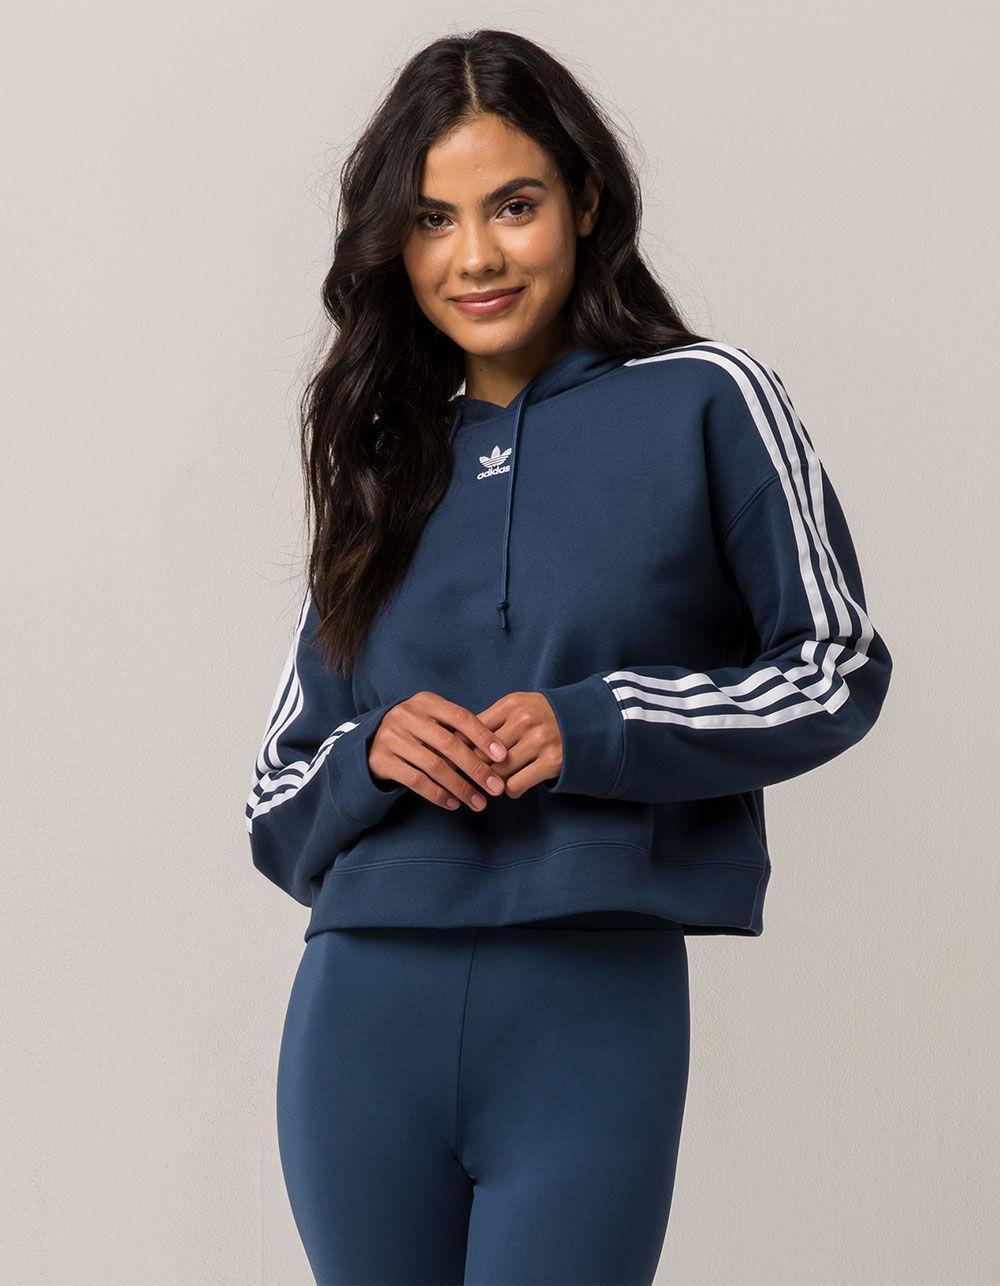 Navy Blue Adidas Shirt Womens Rldm